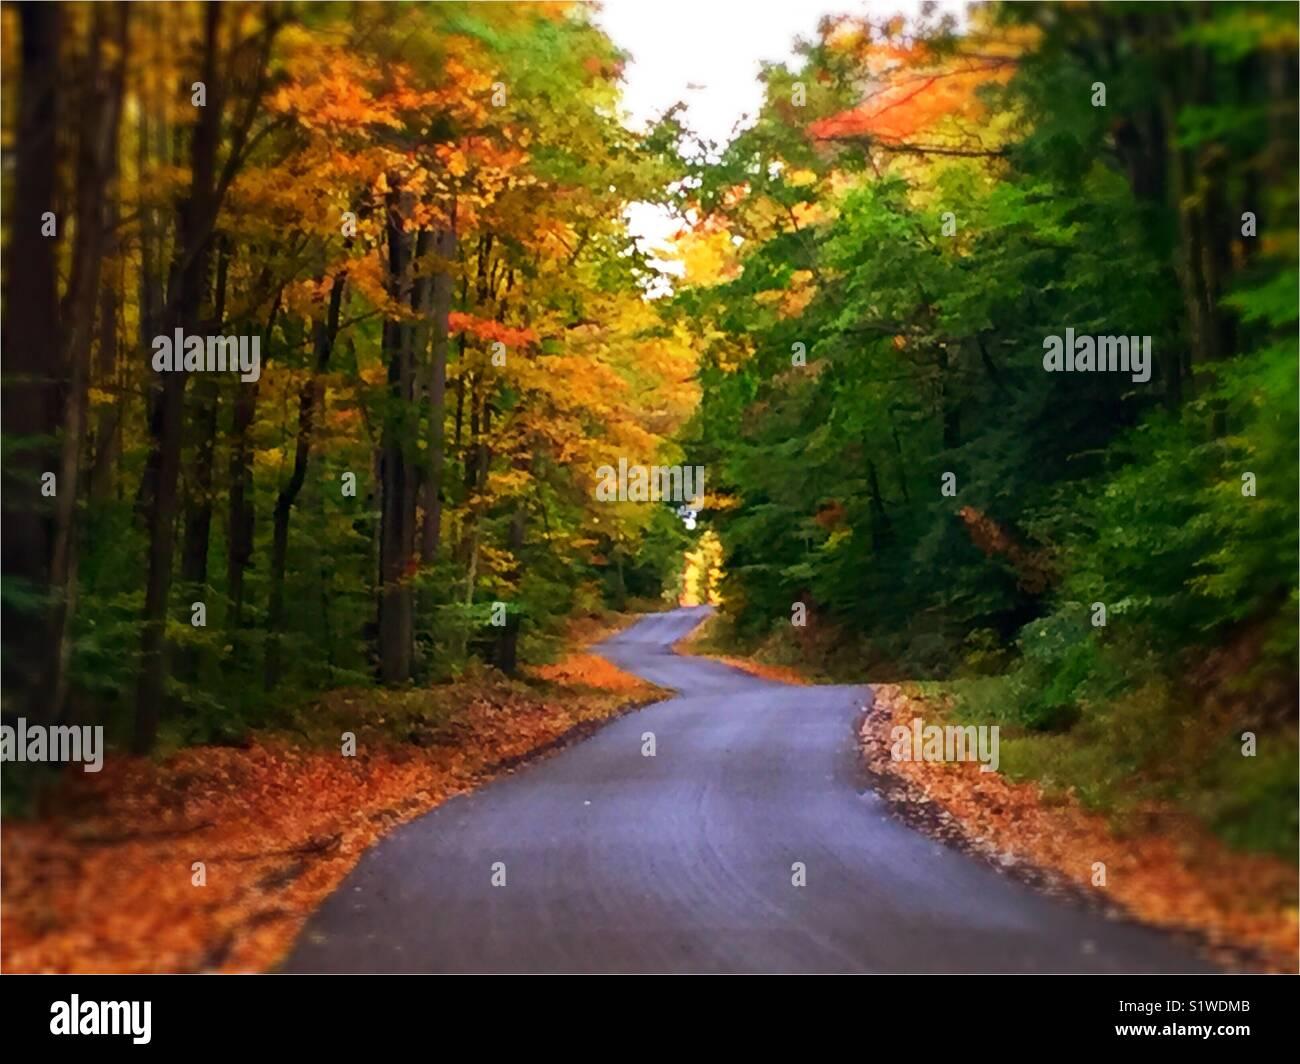 Country Roads Take Me Home Stock Photo Alamy